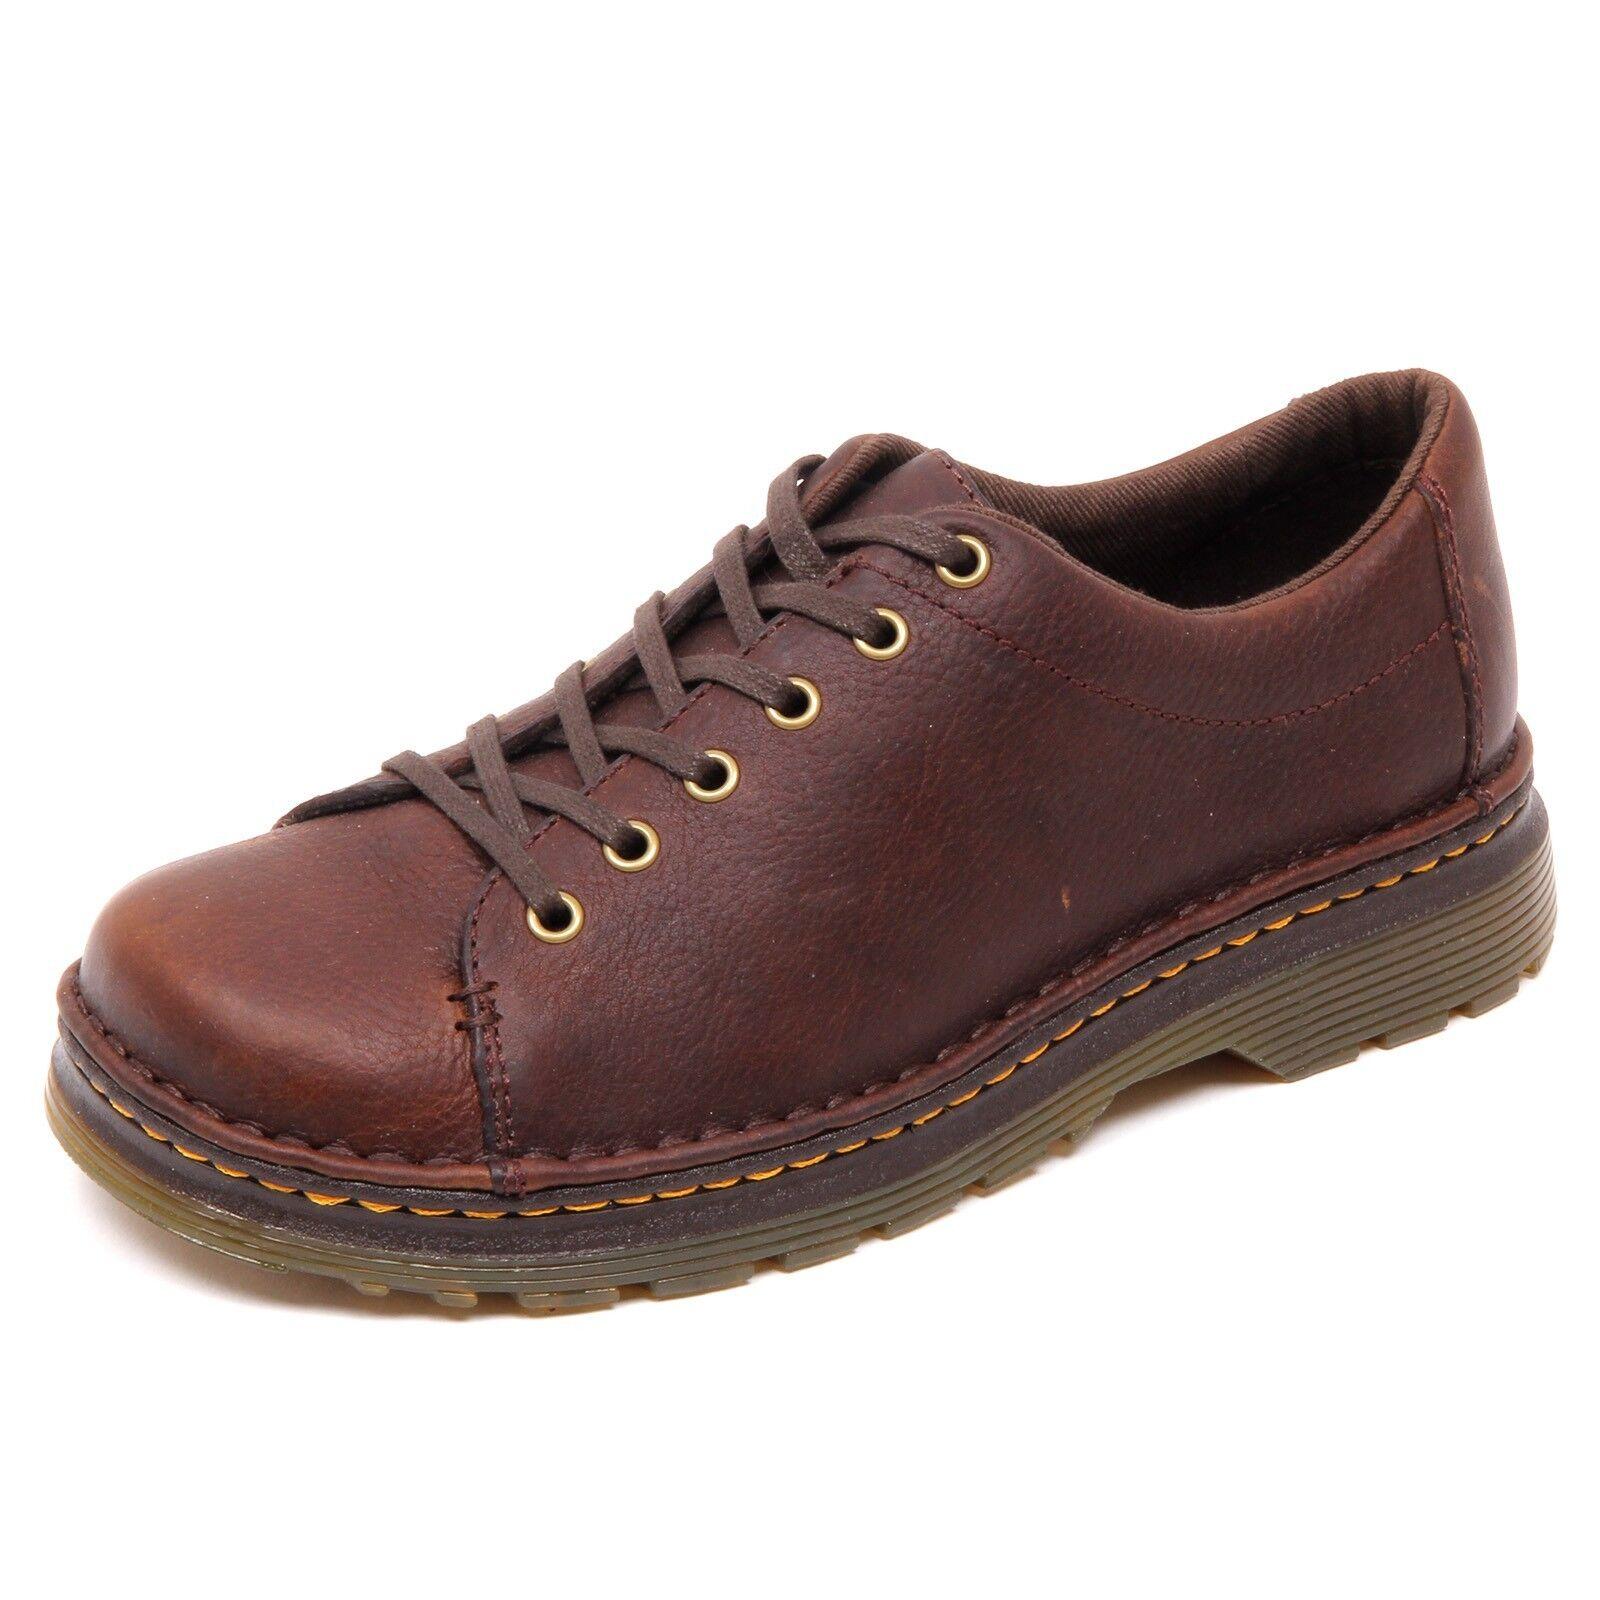 D3644 (without box) scarpa uomo DR. MARTENS marrone vintage shoe man